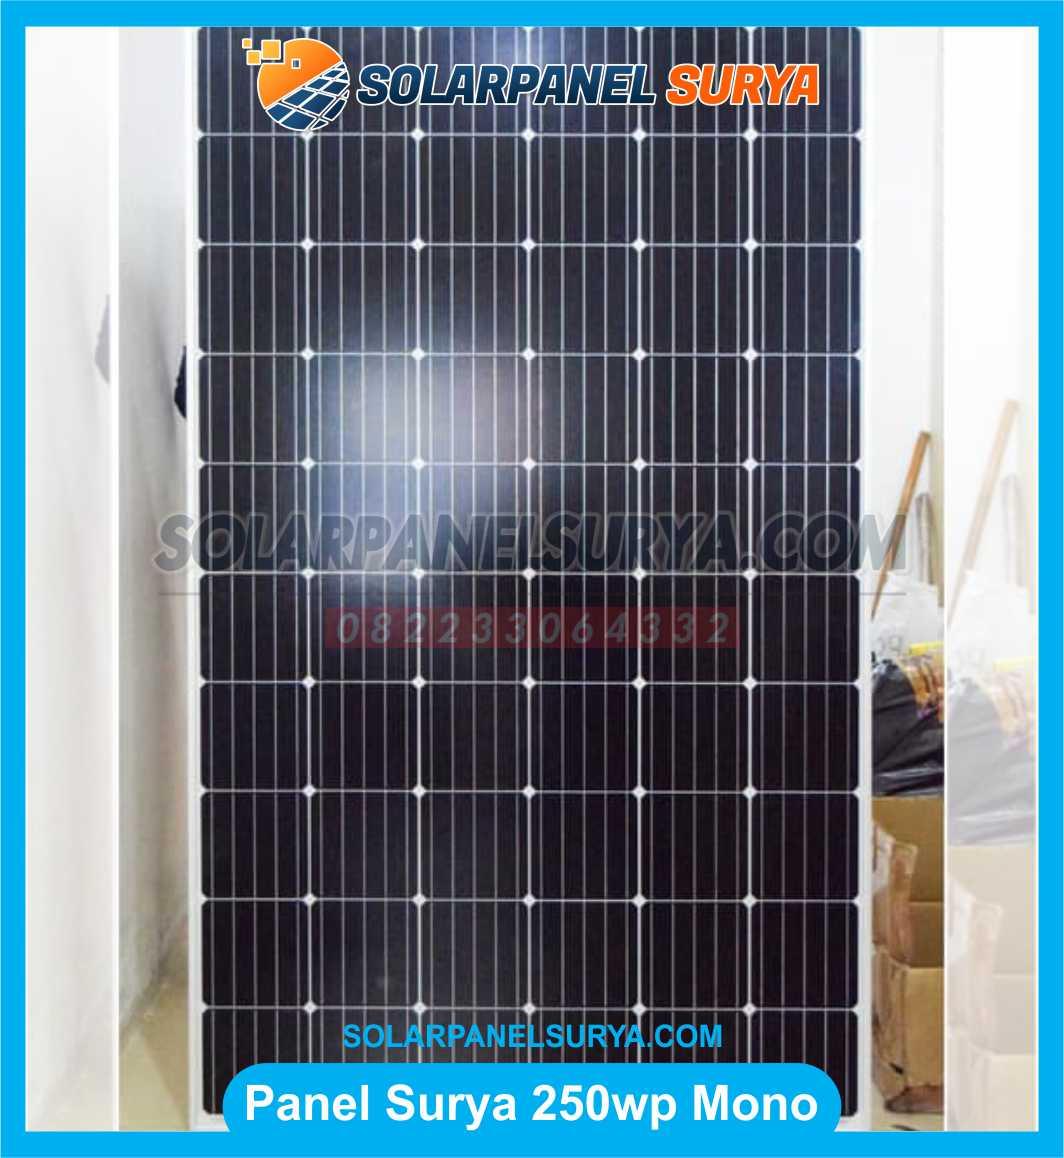 Jual Solar Panel 250 WP Monocrystalline